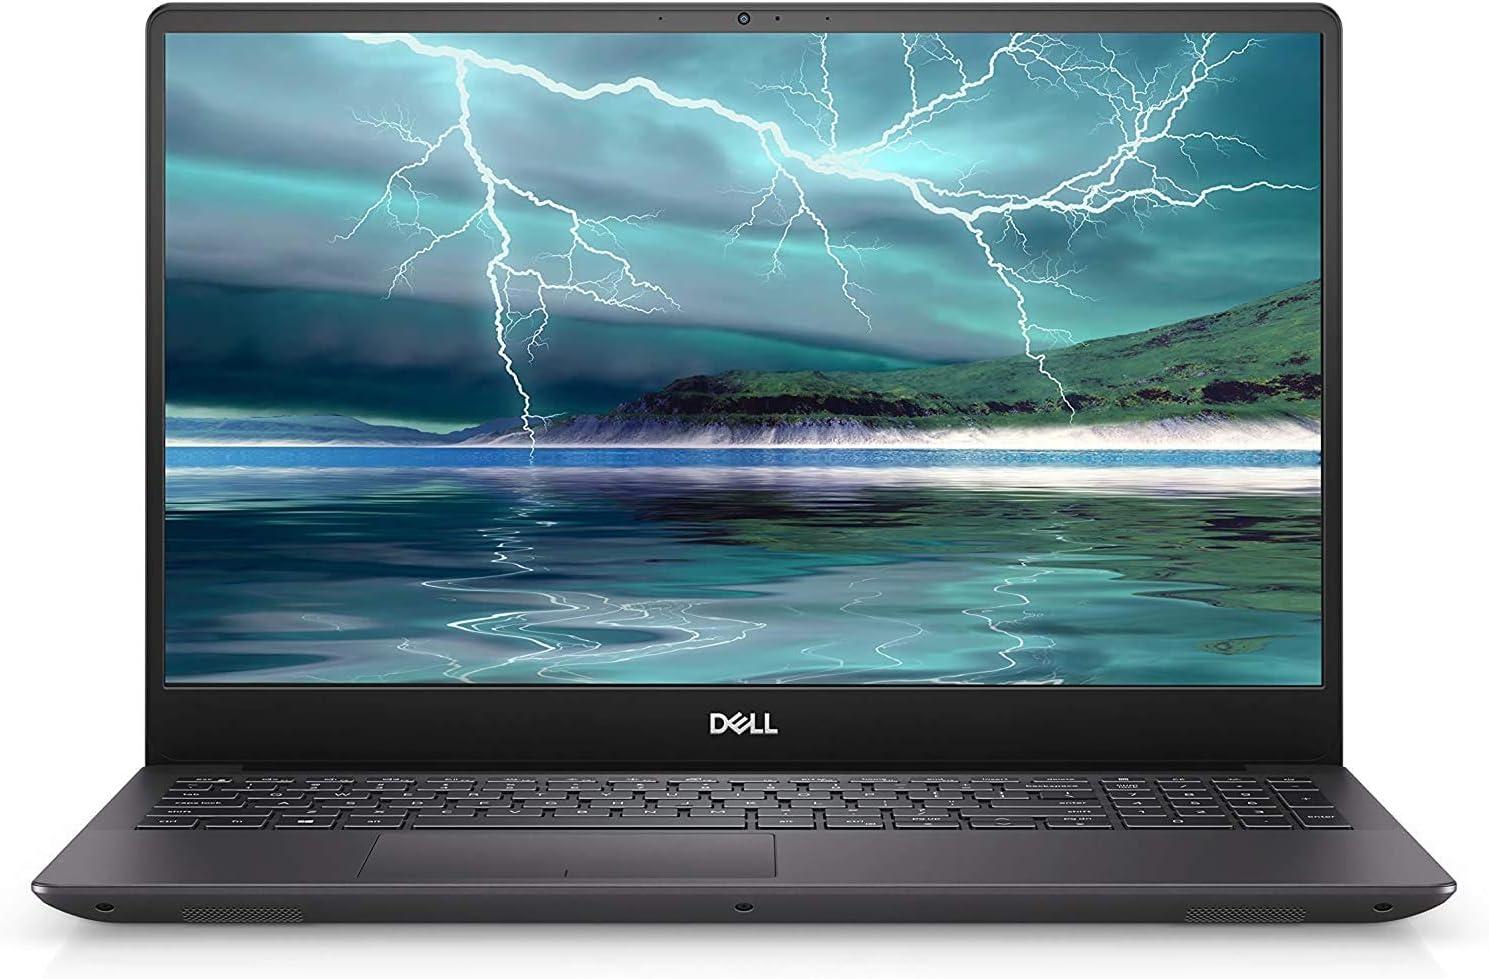 2020 Newest Dell Inspiron Flagship 15 7000 Premium Biz&Gaming Laptop: 15.6